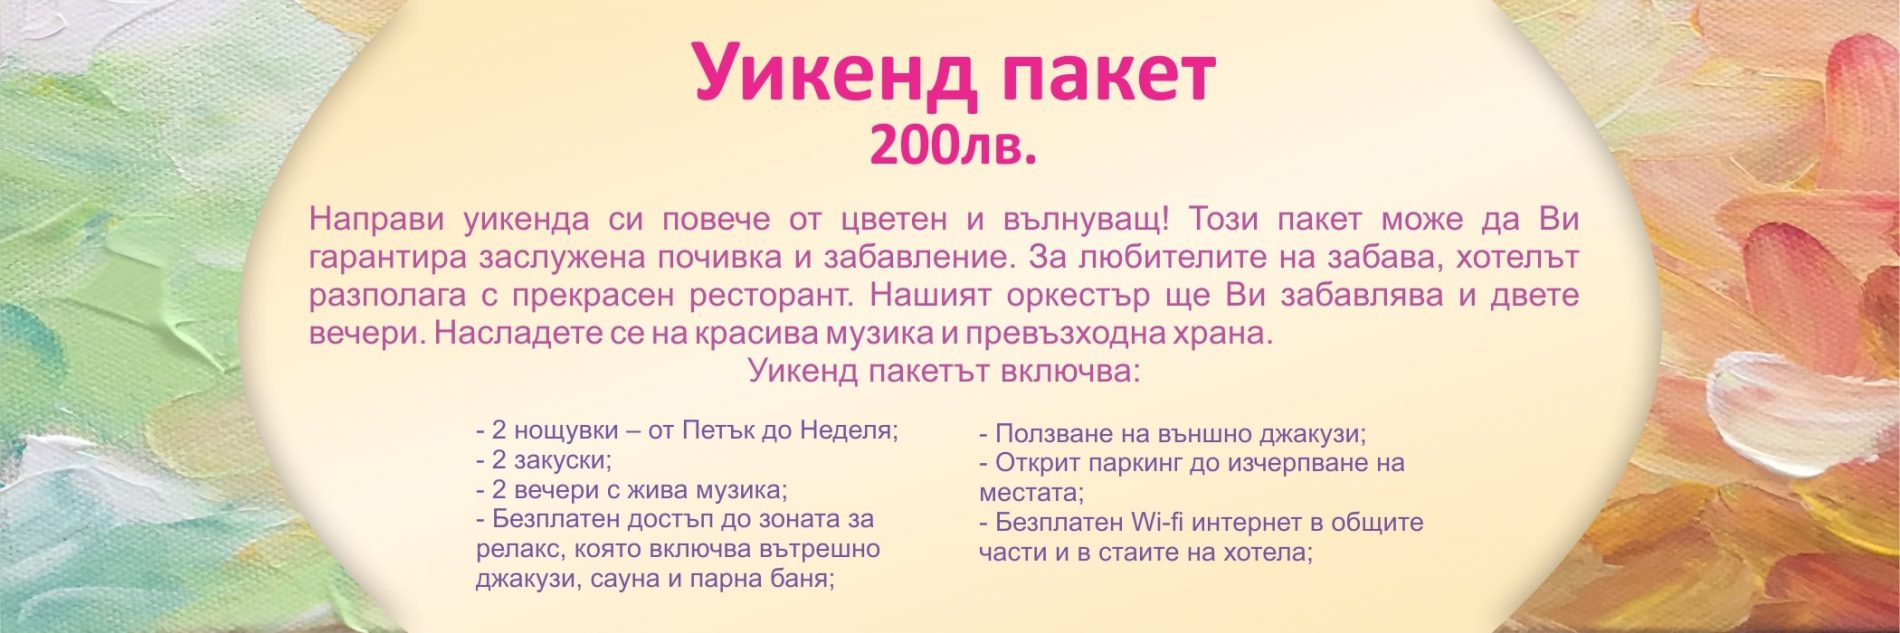 Хотел ПАРК Бачиново Оферта уикенд